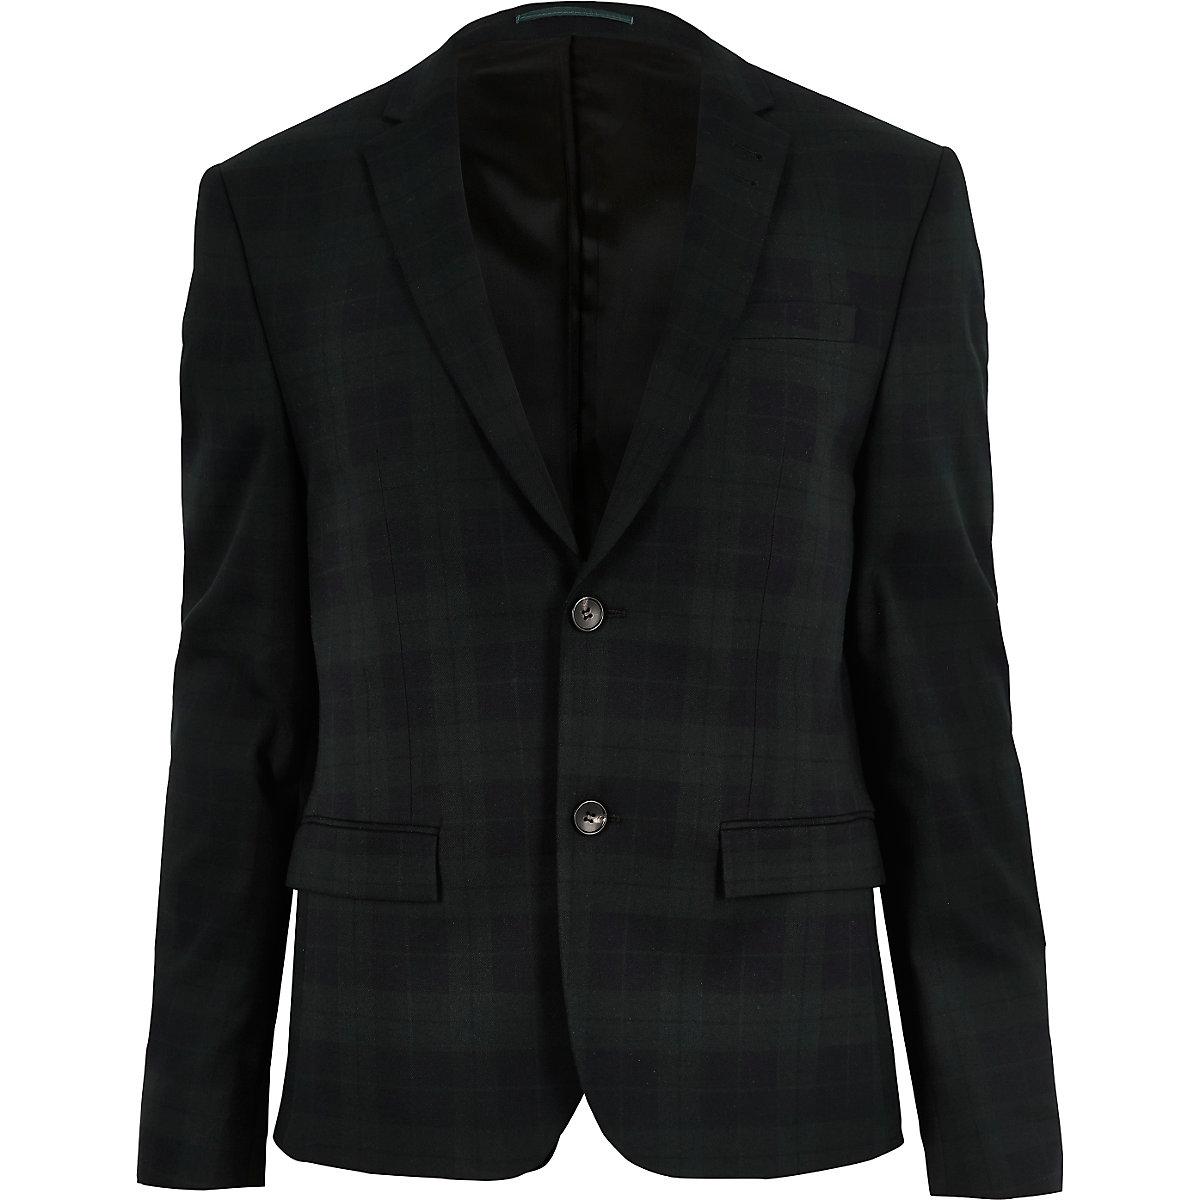 Green plaid skinny suit jacket